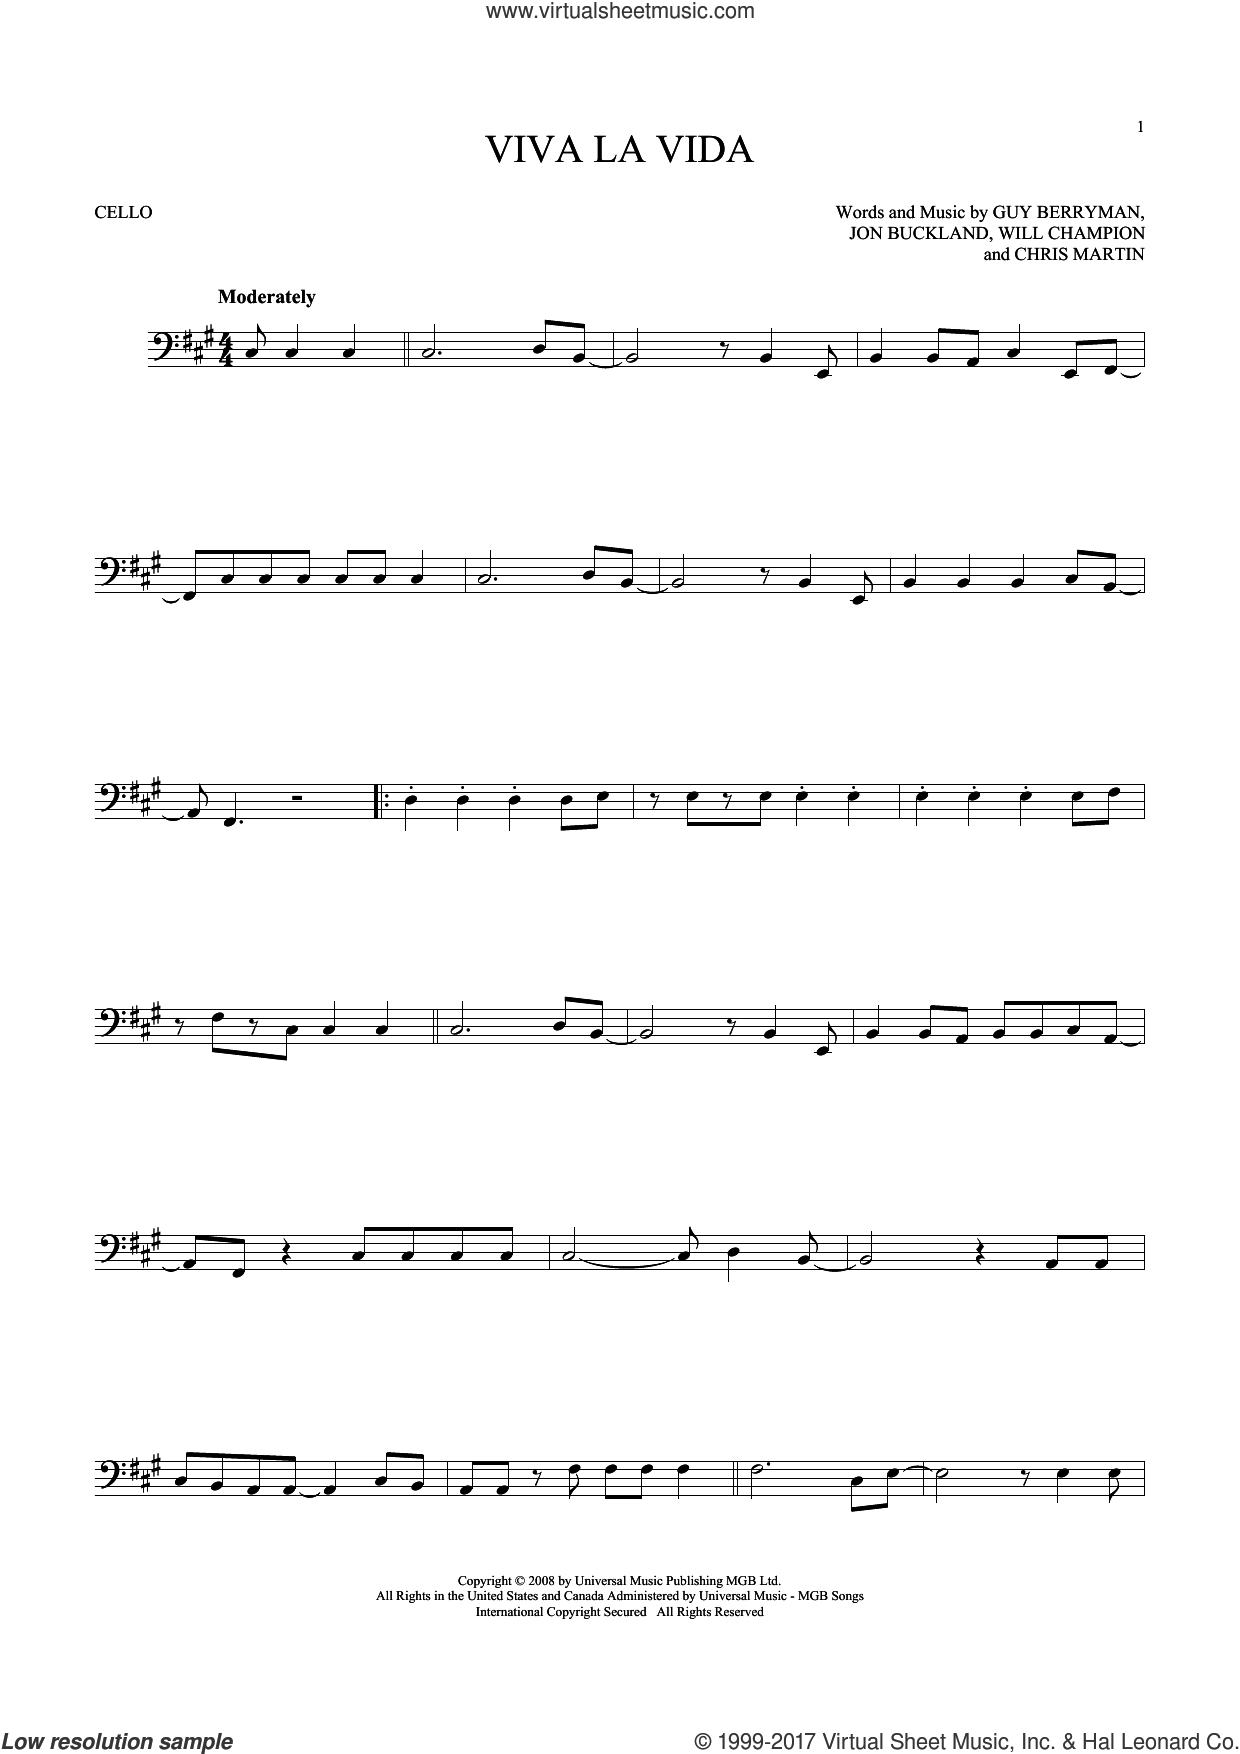 Coldplay - Viva La Vida Sheet Music For Cello Solo [Pdf] - Free Printable Violin Sheet Music For Viva La Vida